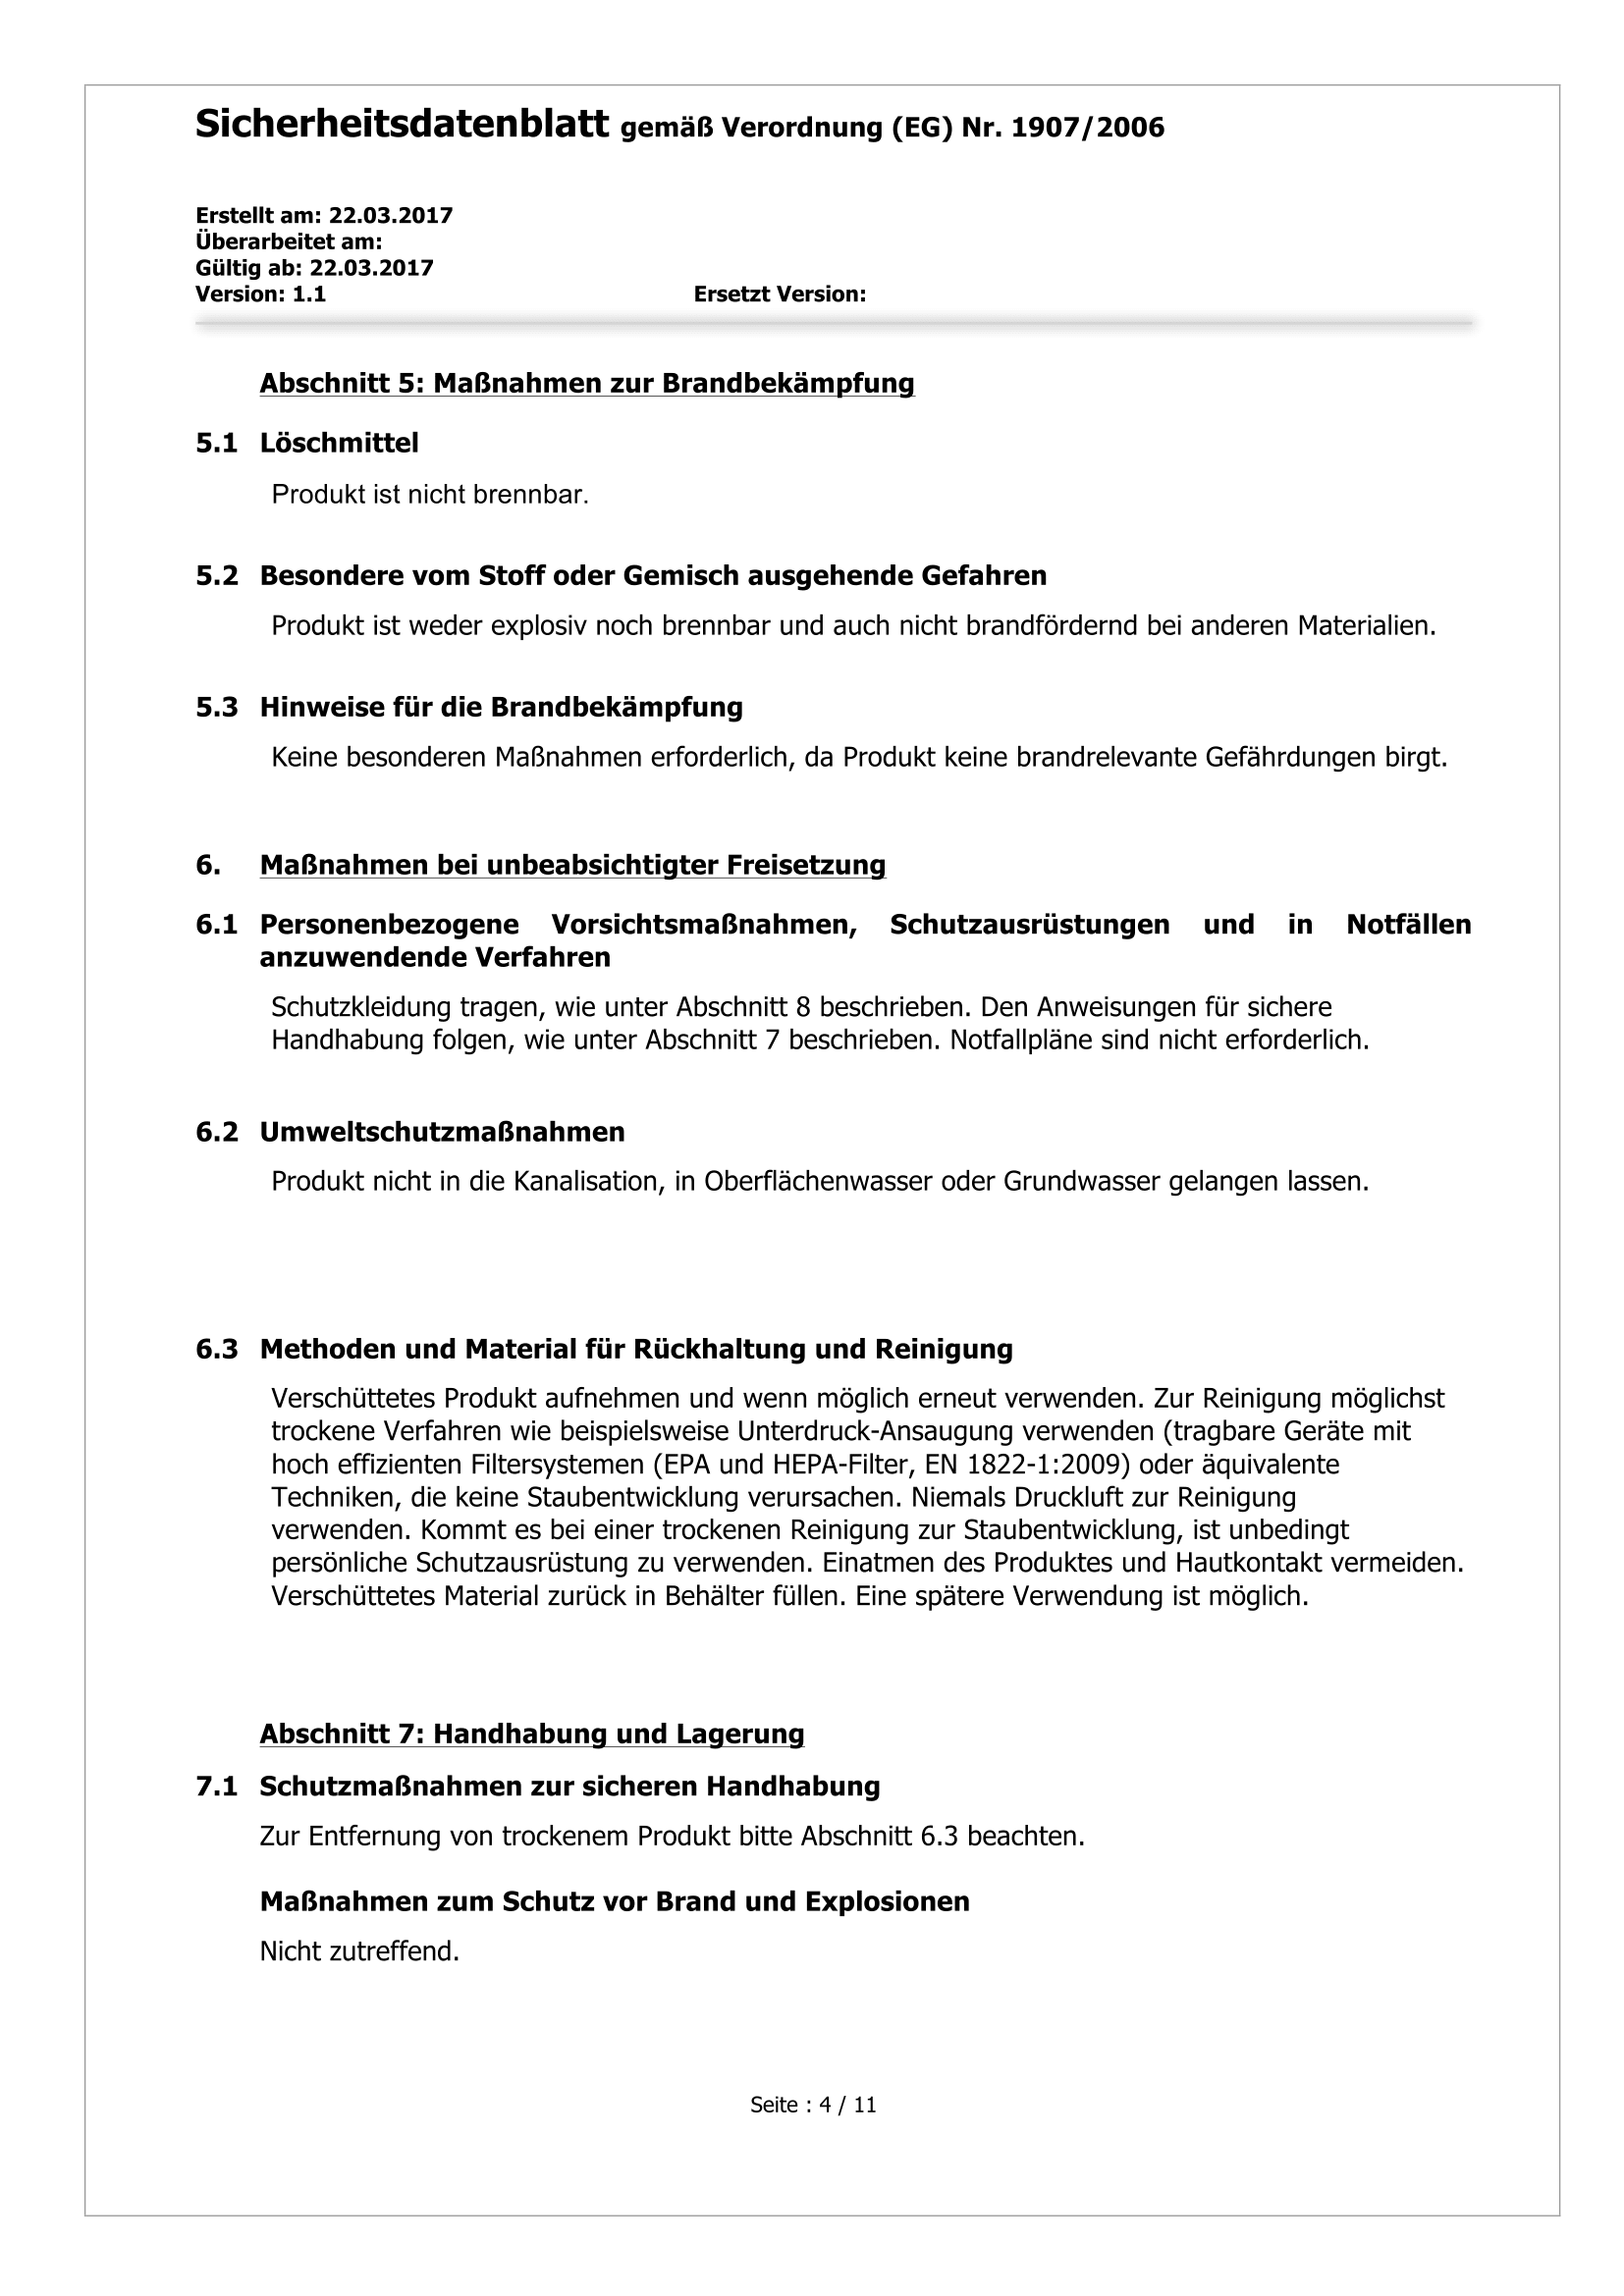 MSDB_MC40-04.png